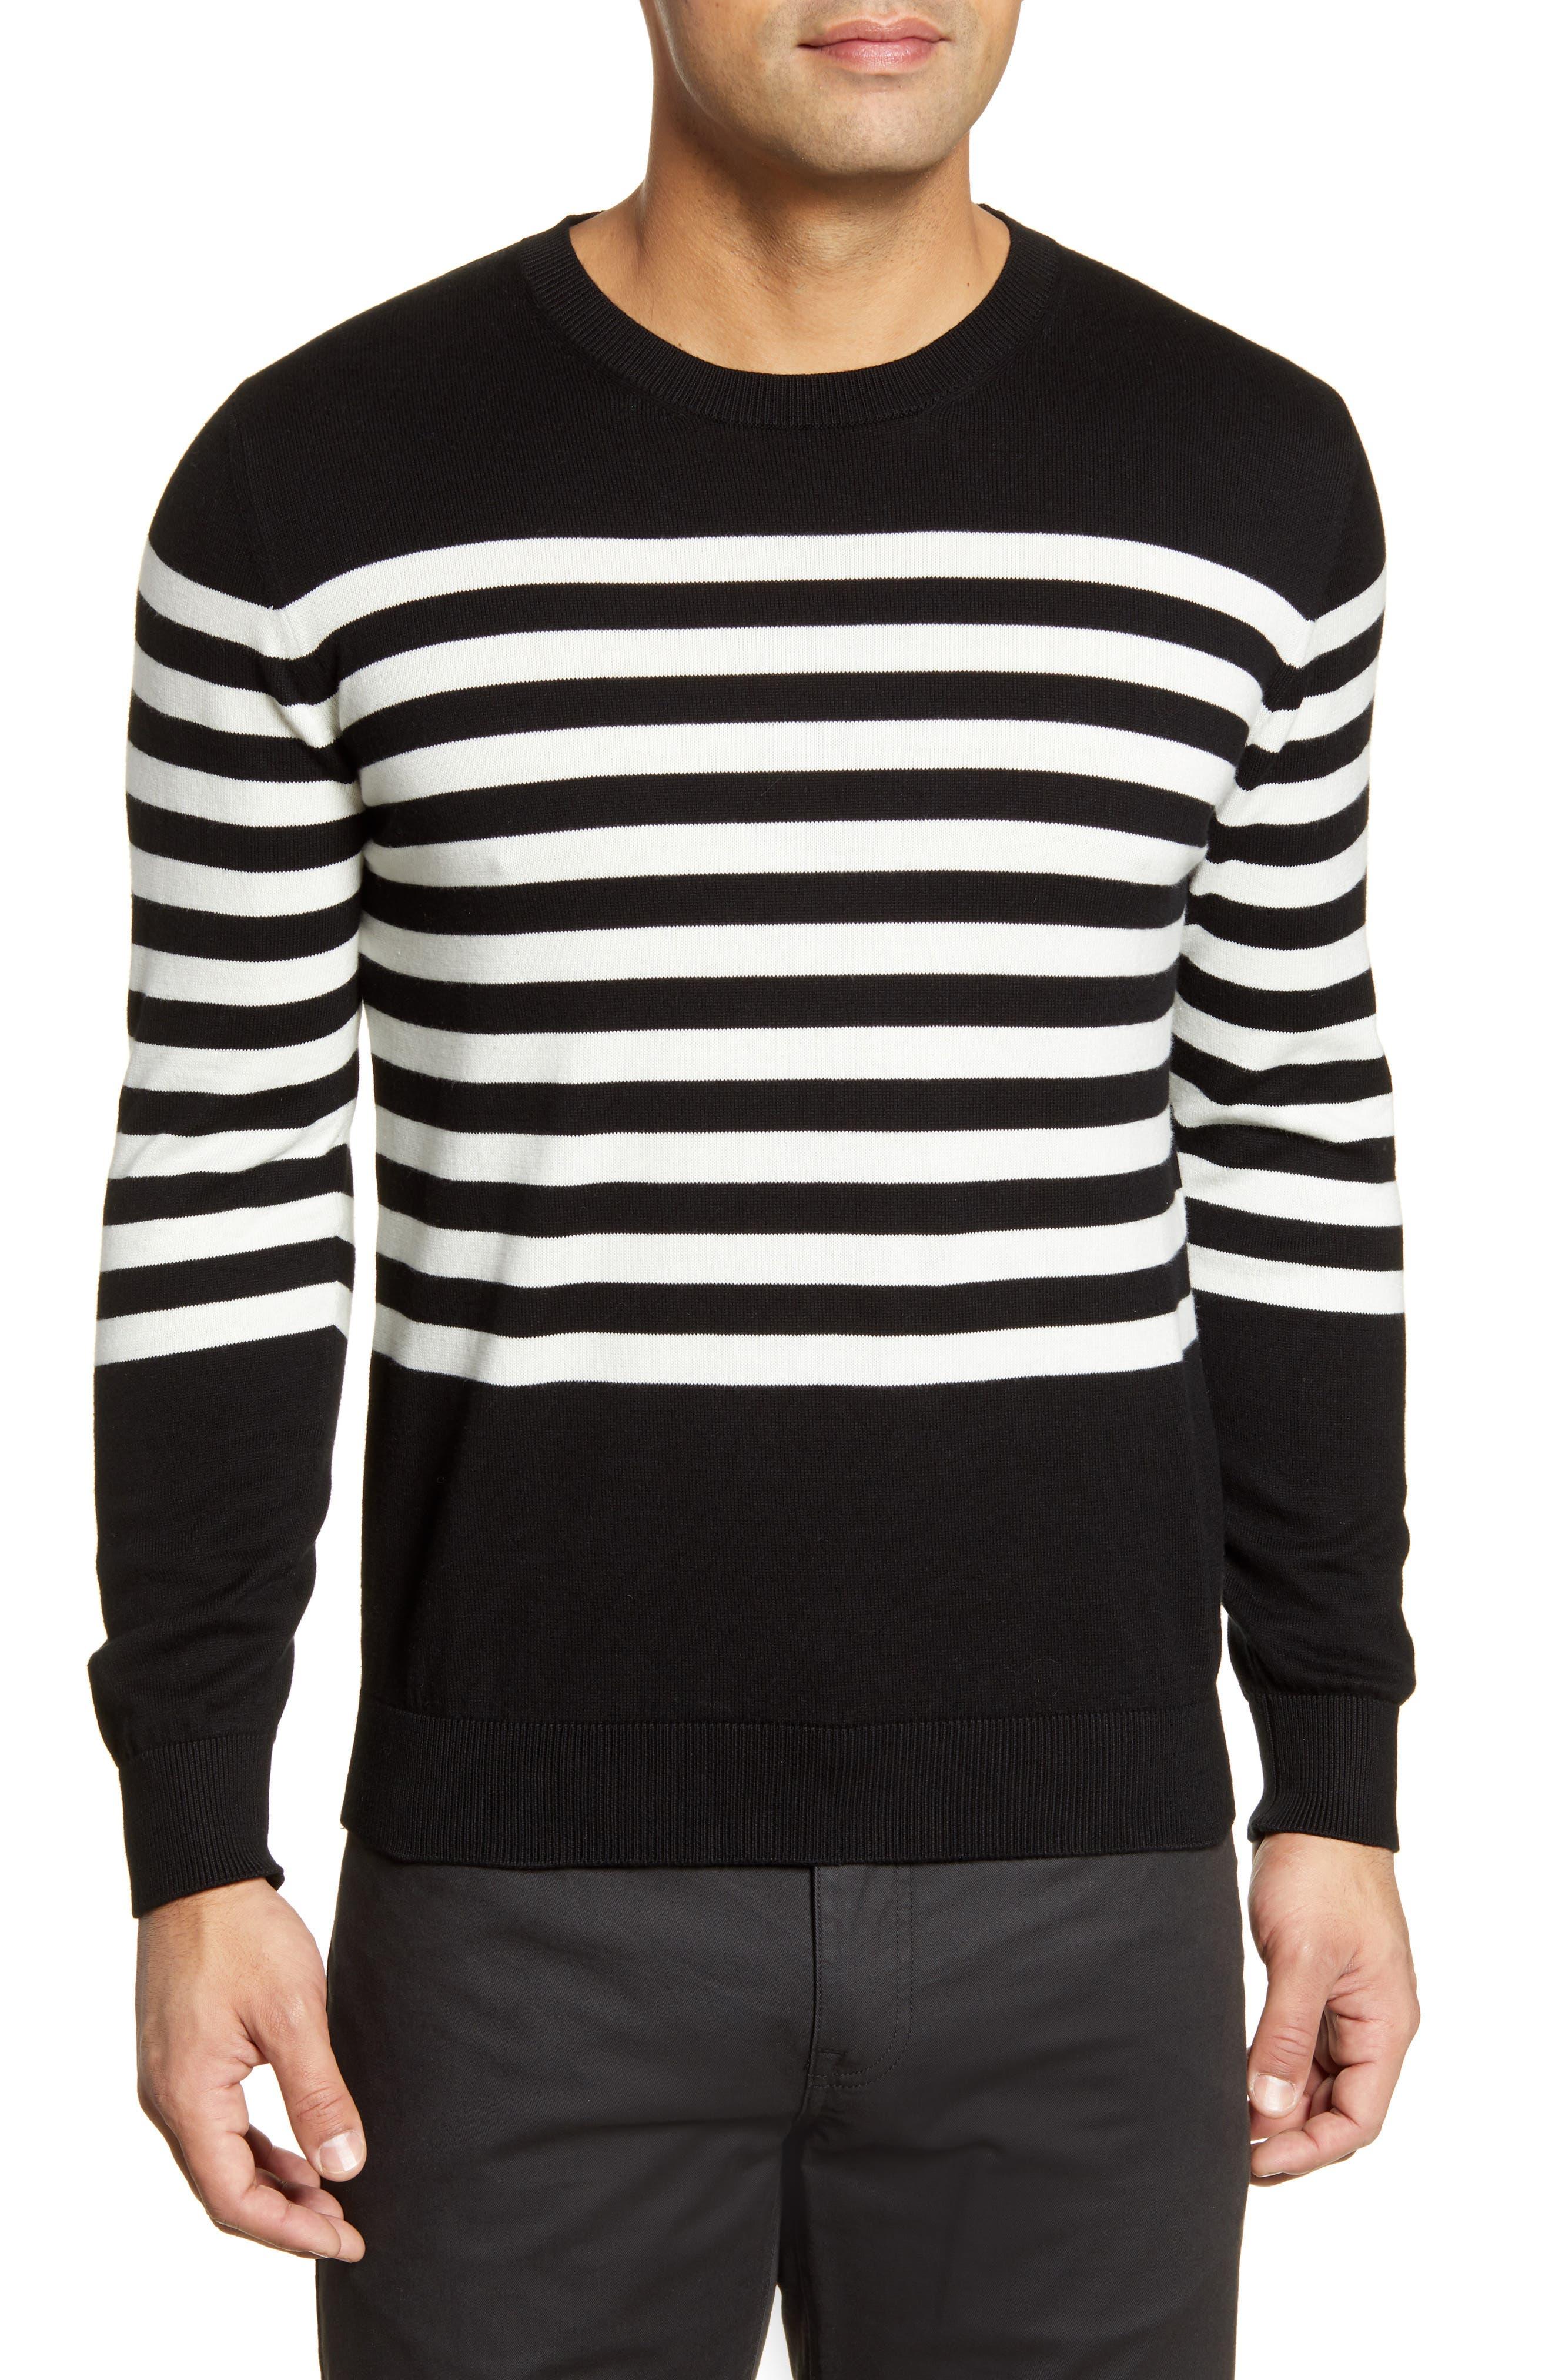 Image of Bugatchi Breton Stripe Sweater